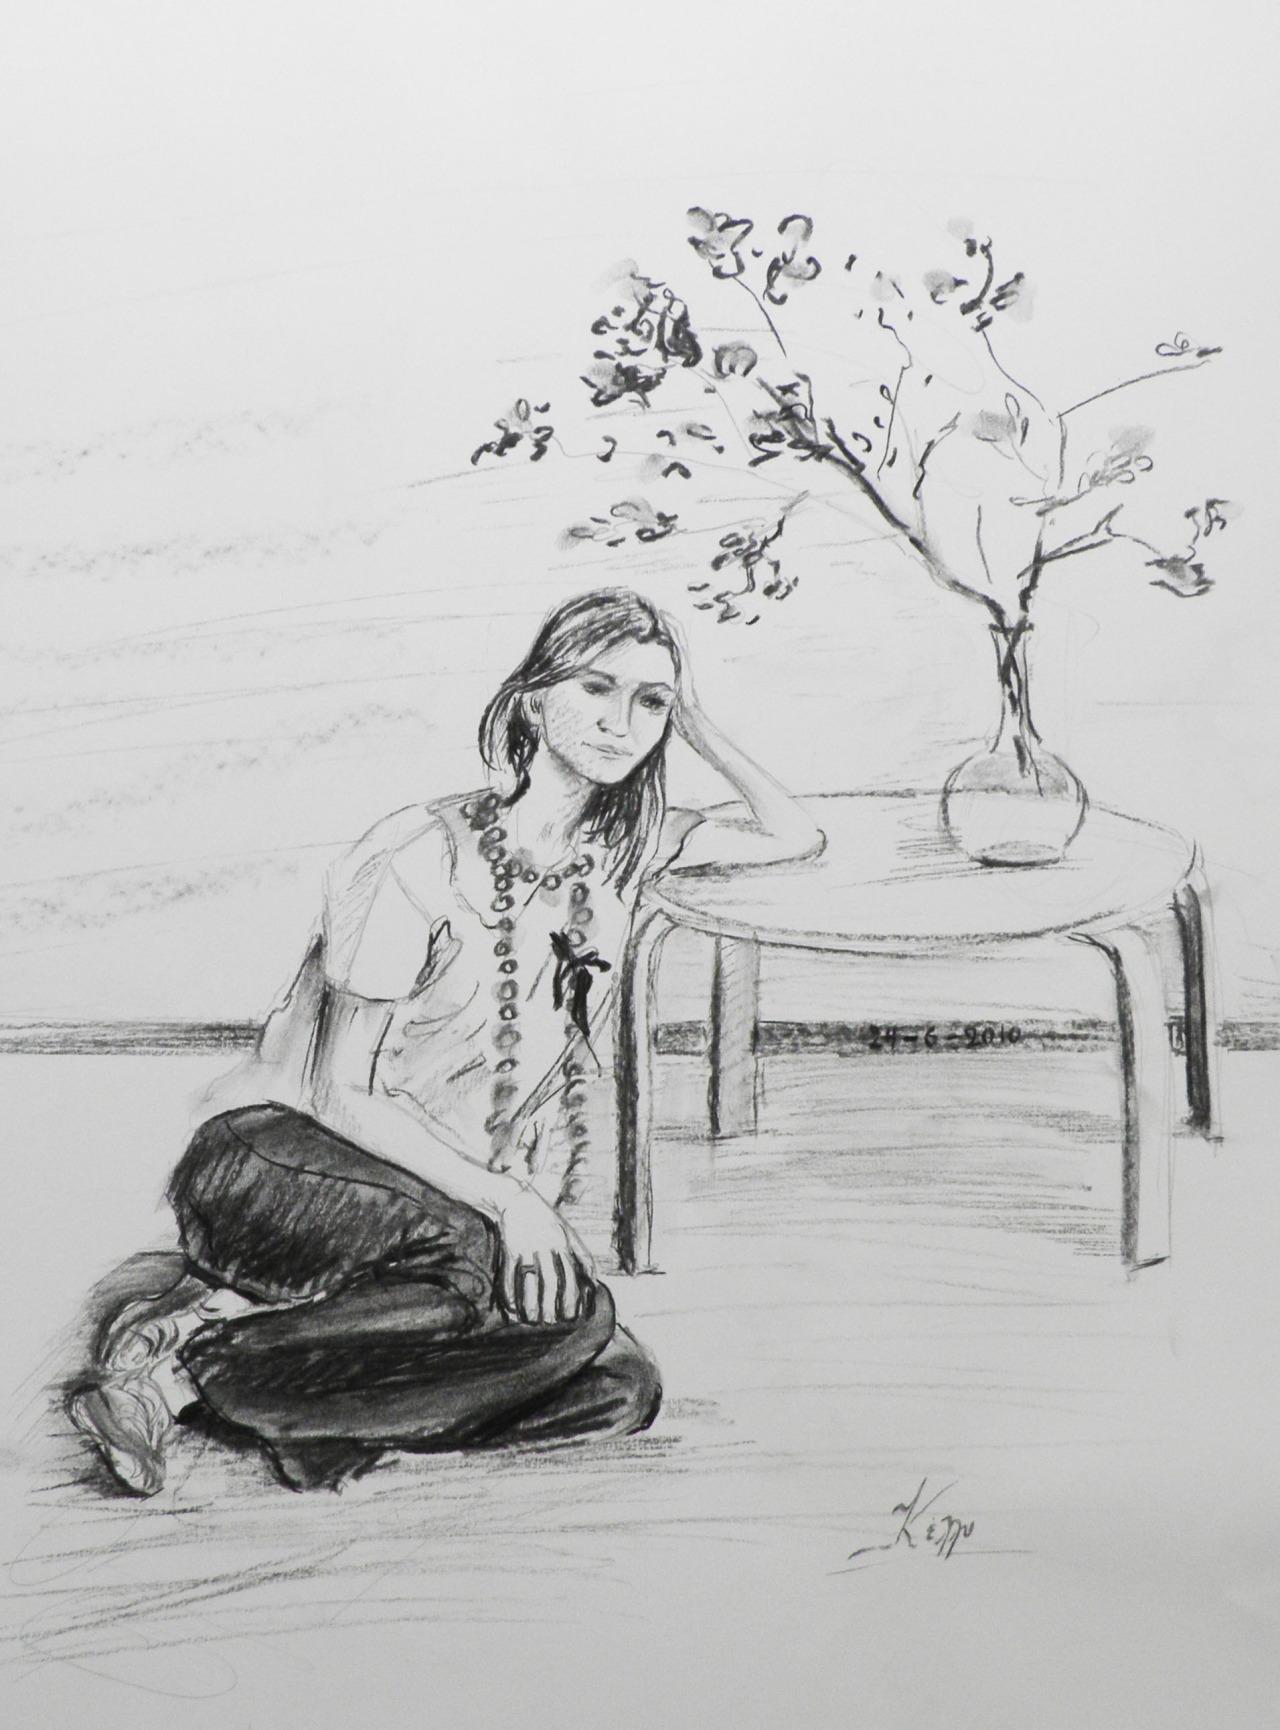 Kelly Papastogiannoudi - Artist